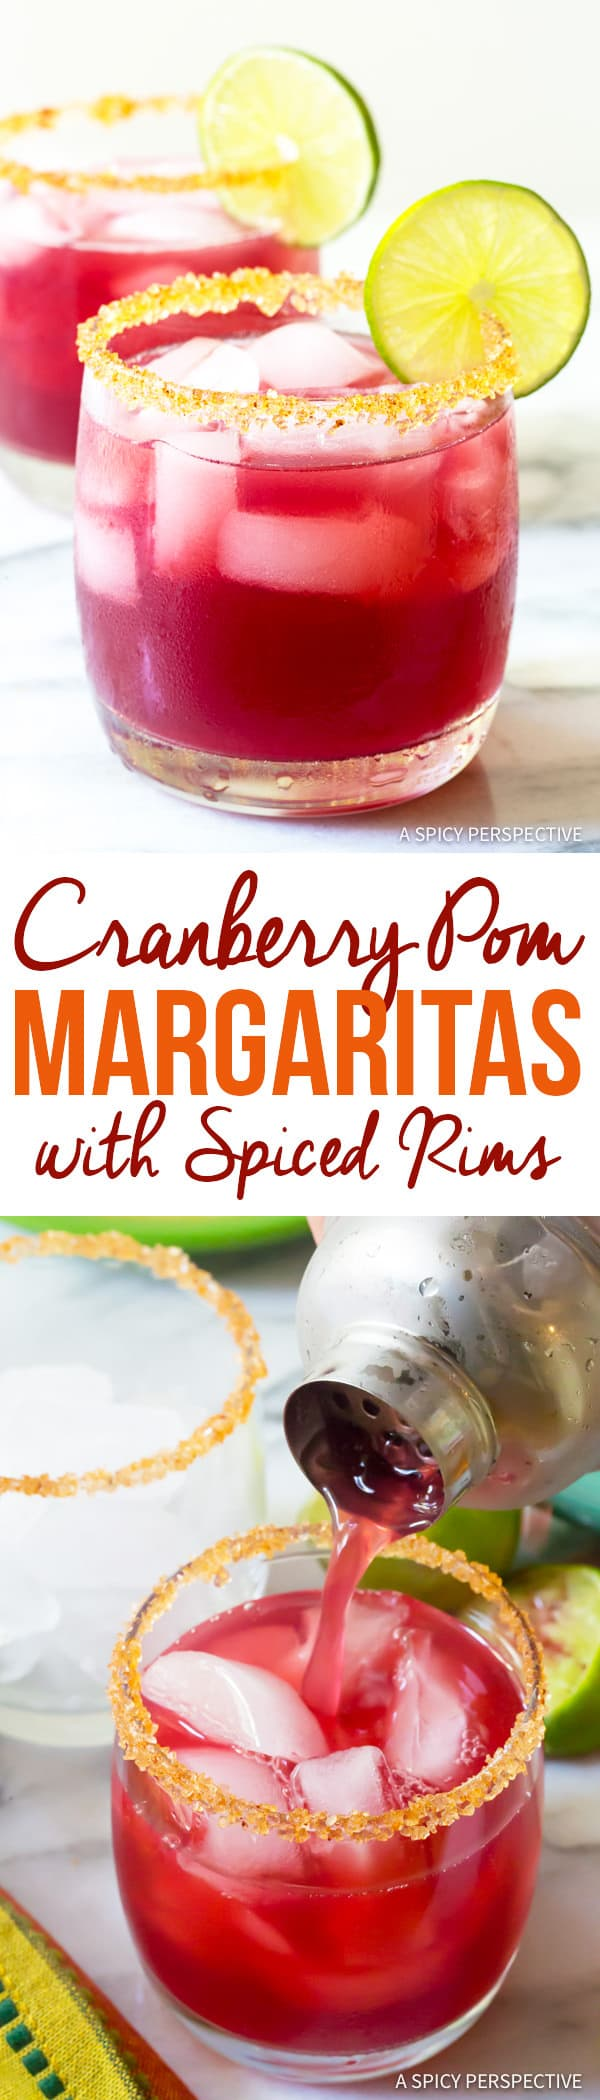 Dazzling Cranberry Pomegranate Margarita with Spiced Rim Recipe | ASpicyPerspective.com